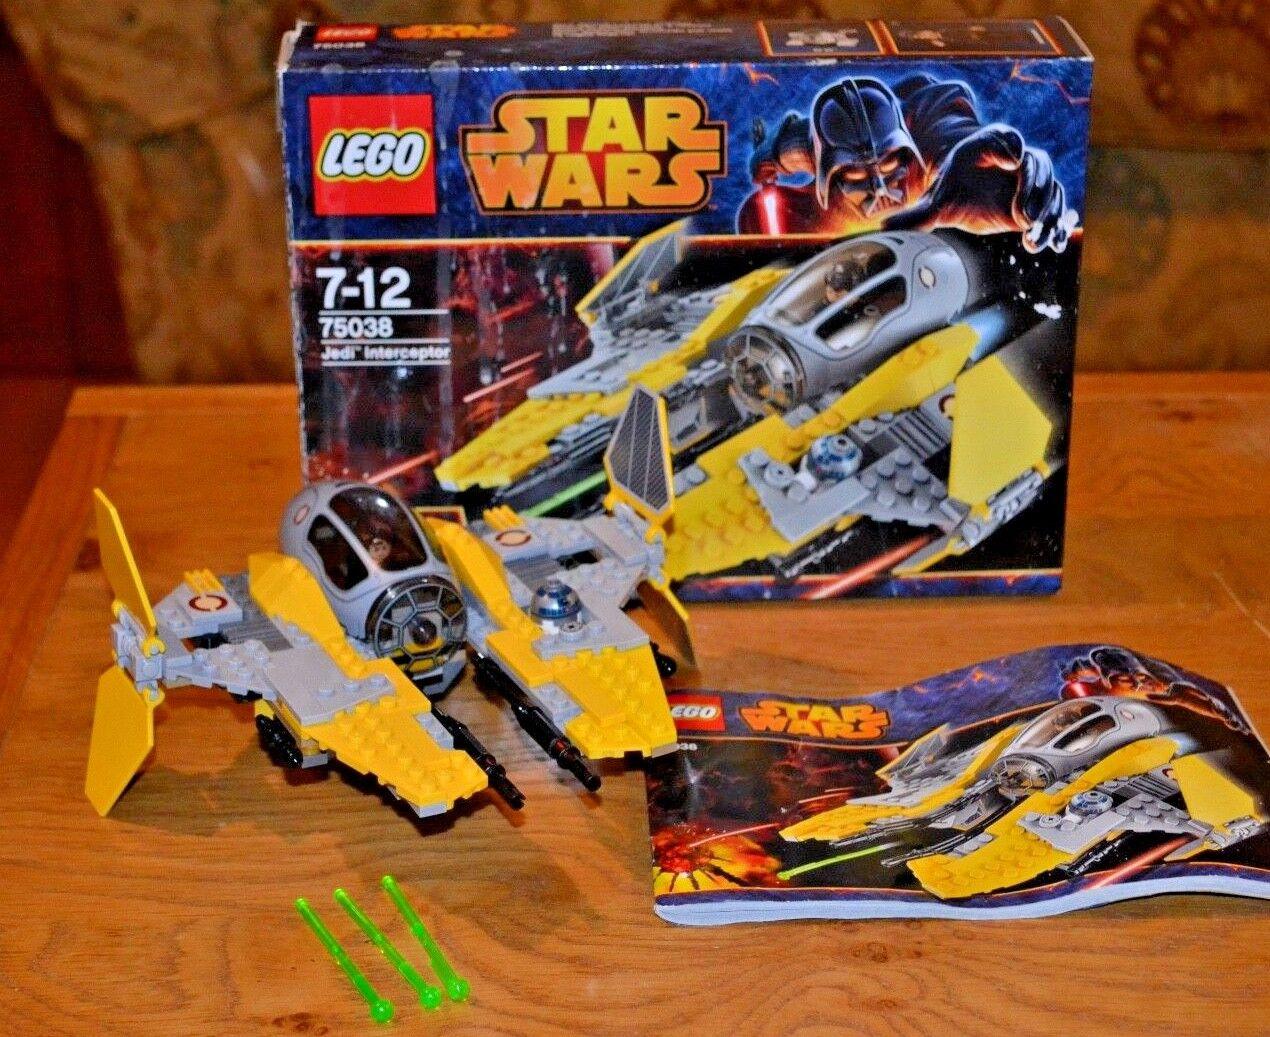 LEGO Star Wars Jedi Jedi Jedi Interceptor - 75038 - 100% Complete; Boxed with Mini Figures f91fdf